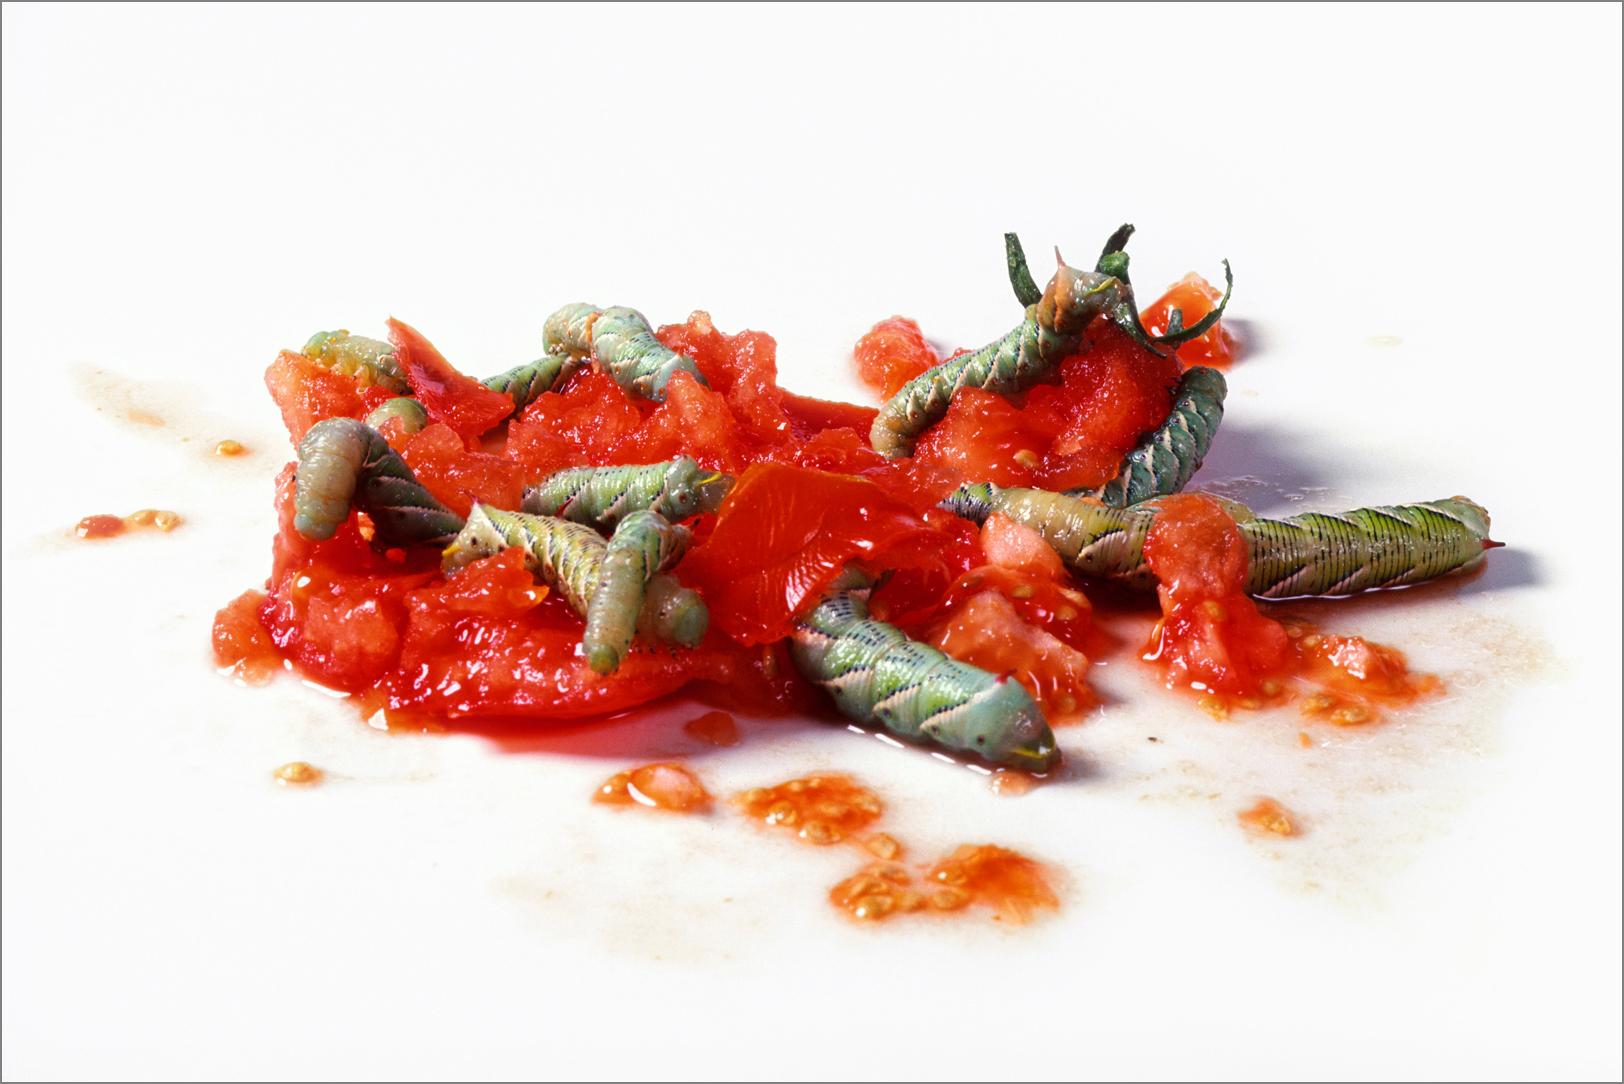 fc_tomato8_4g.jpg